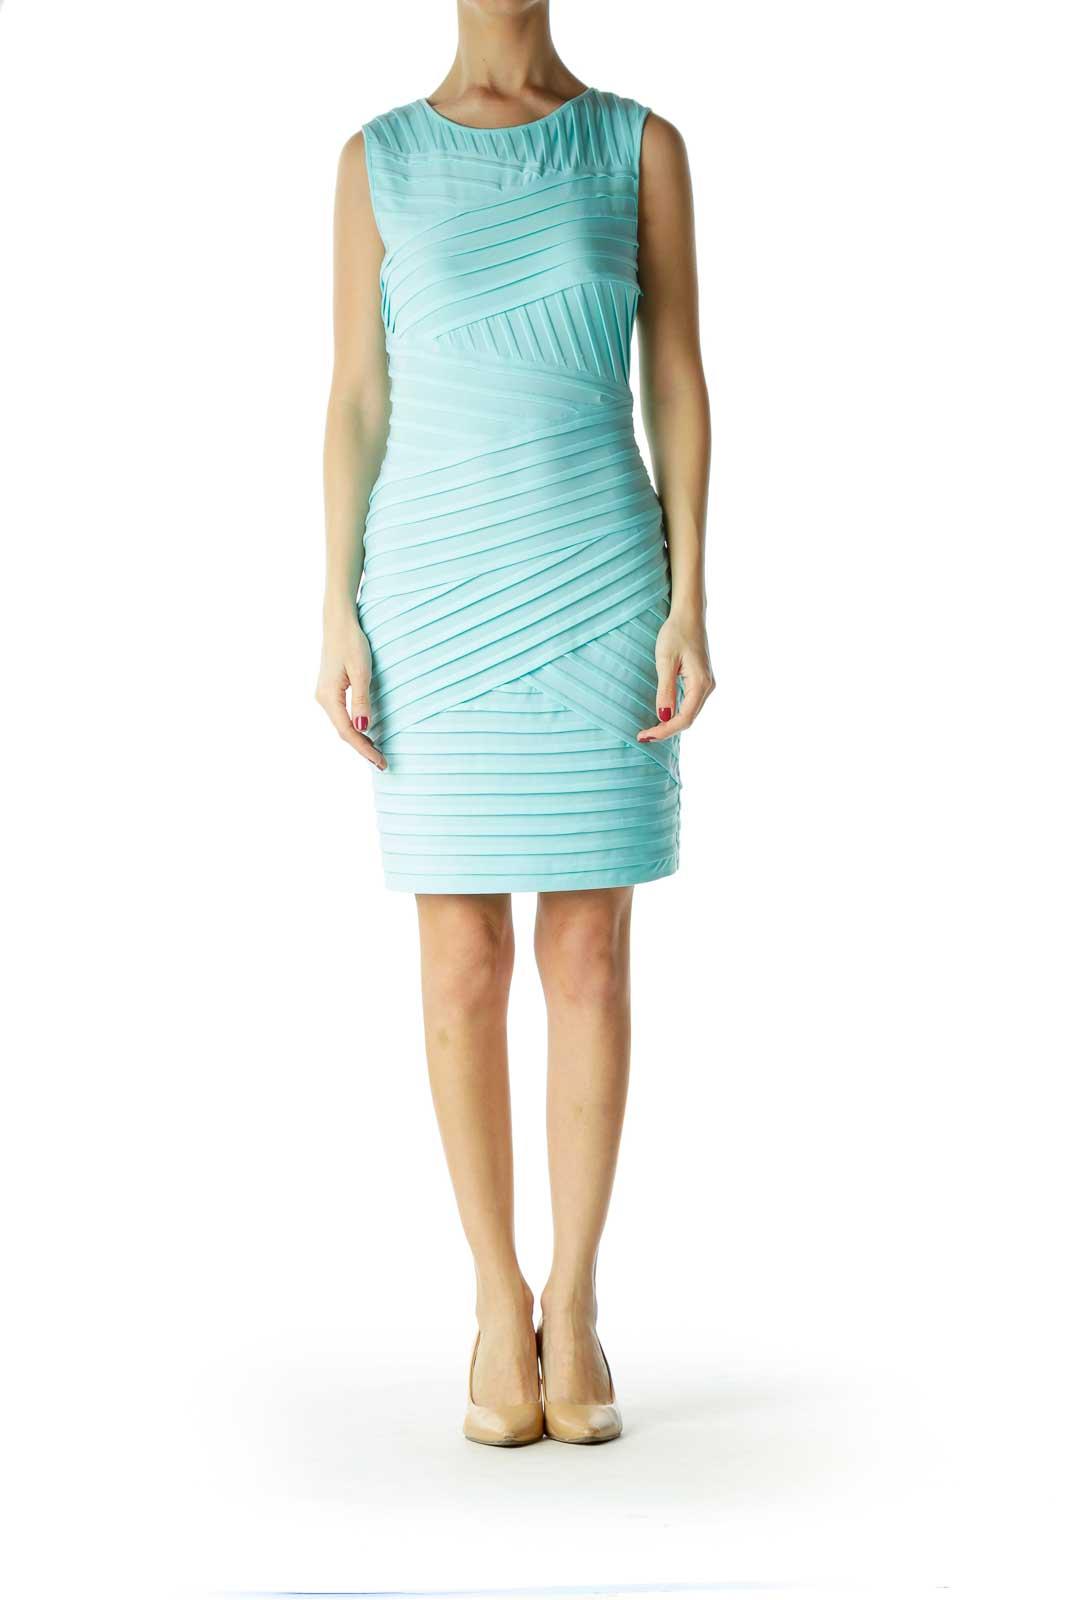 Blue Sleeveless Cocktail Dress